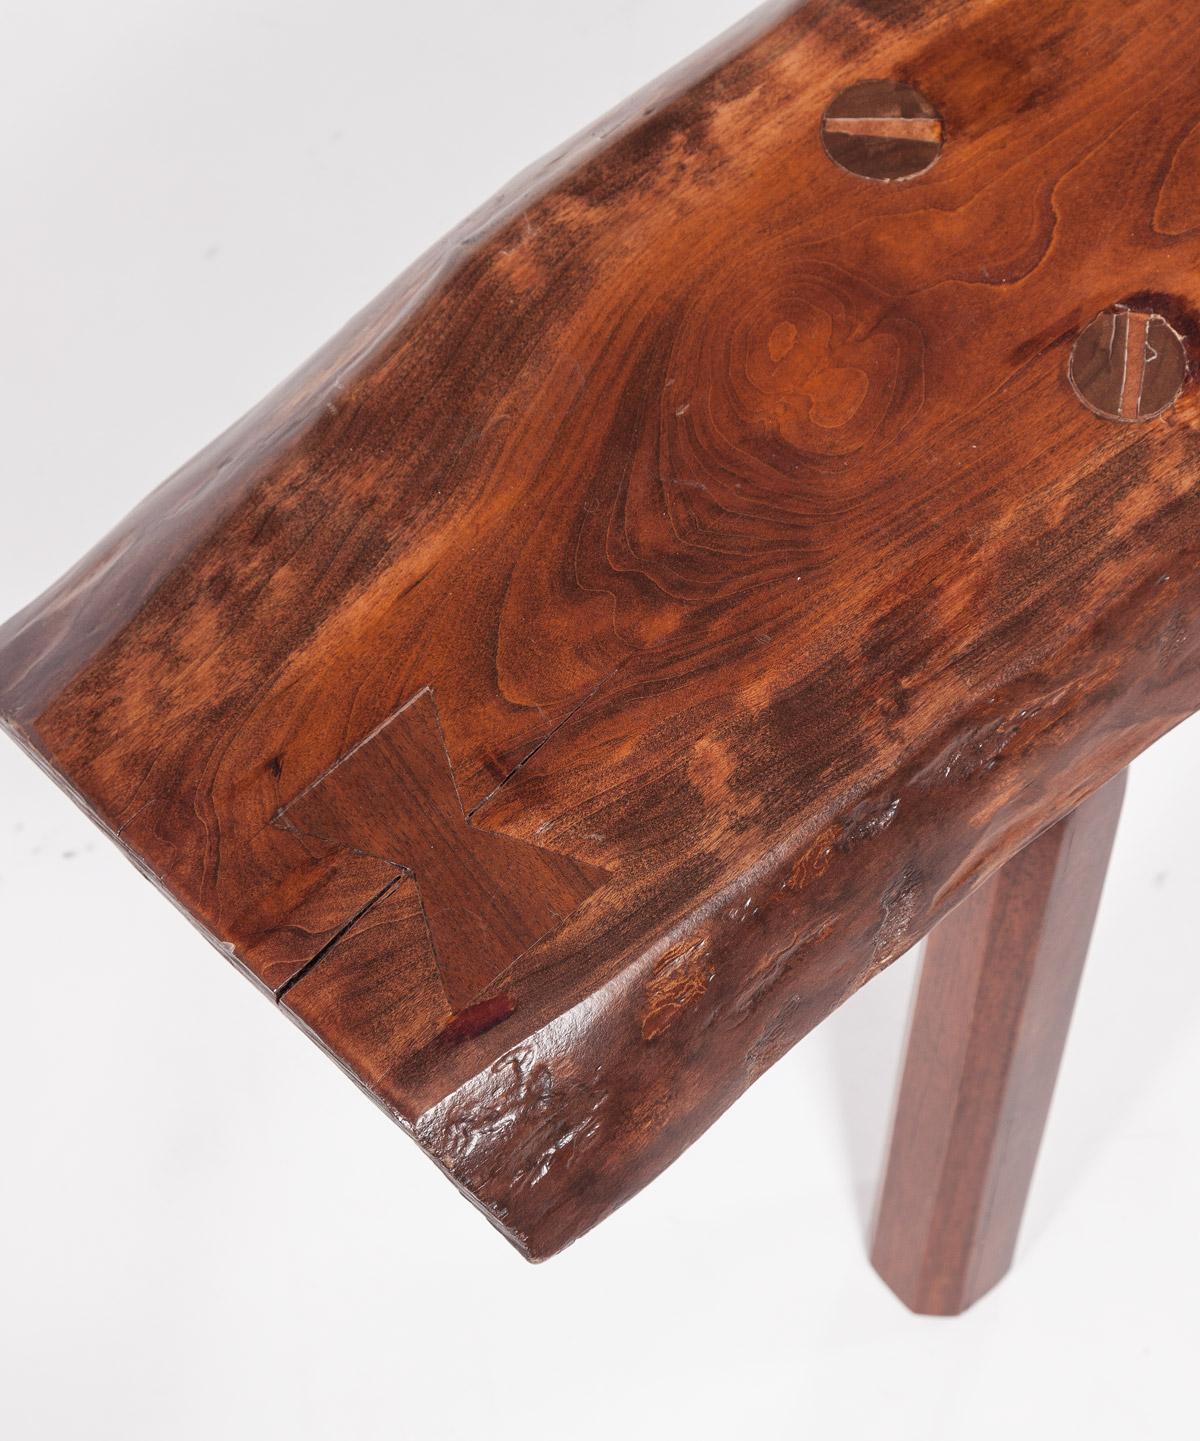 Artisan Natural Wood Bench